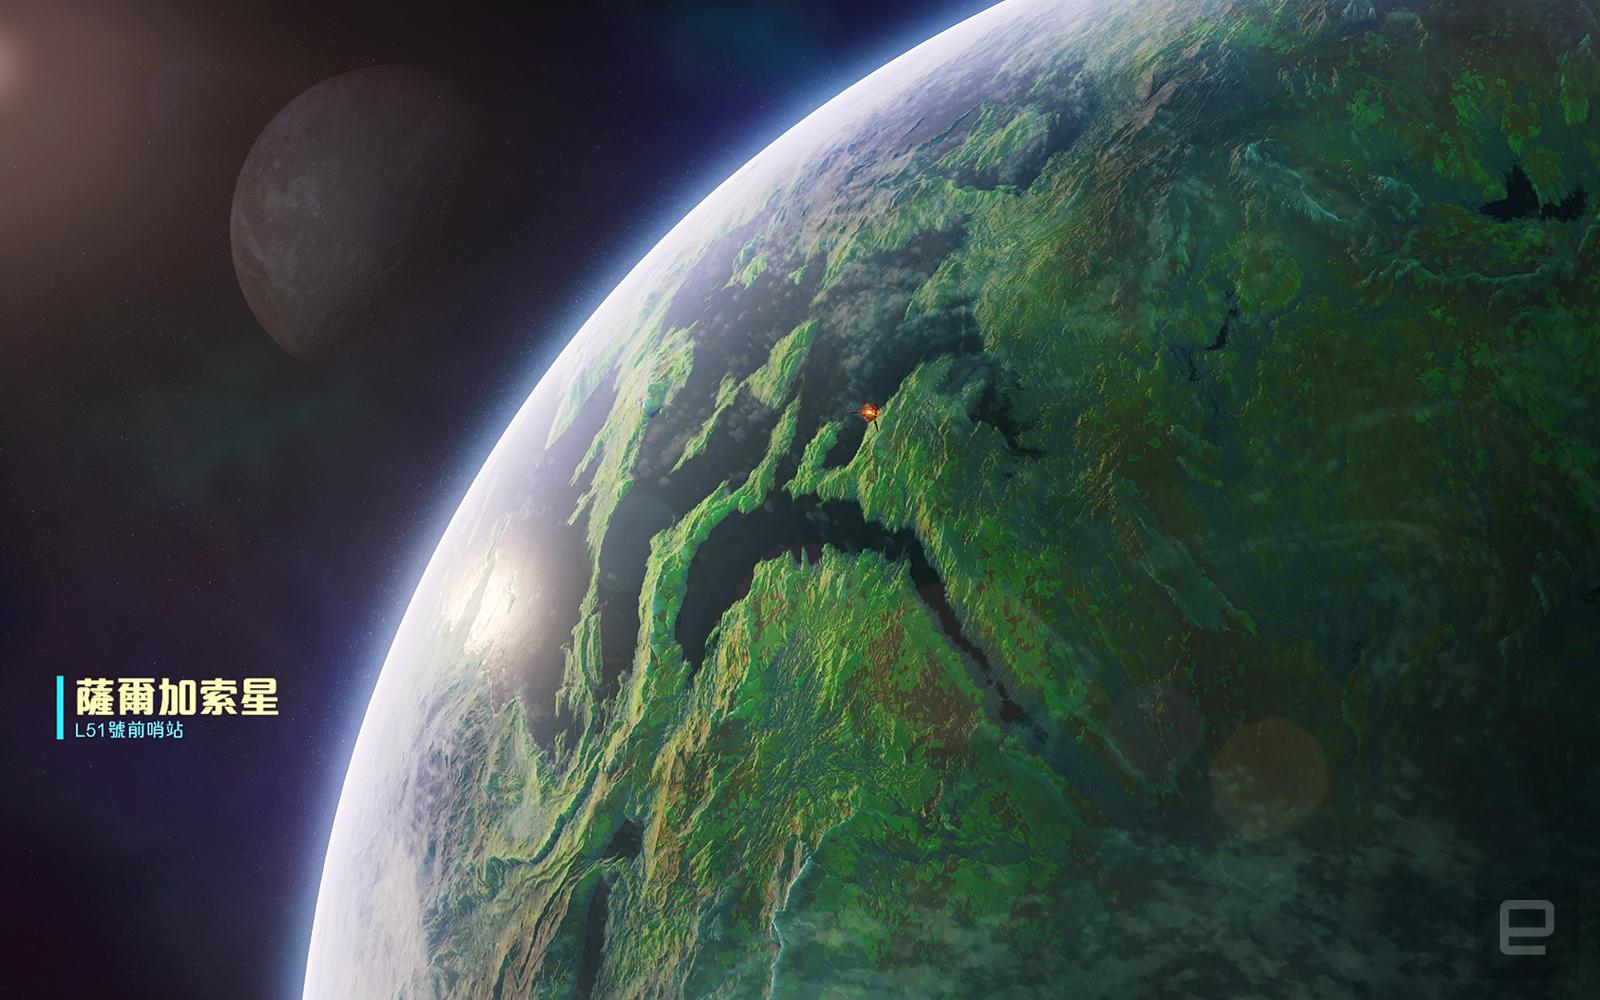 Ratchet & Clank Rift Apart Planet 2